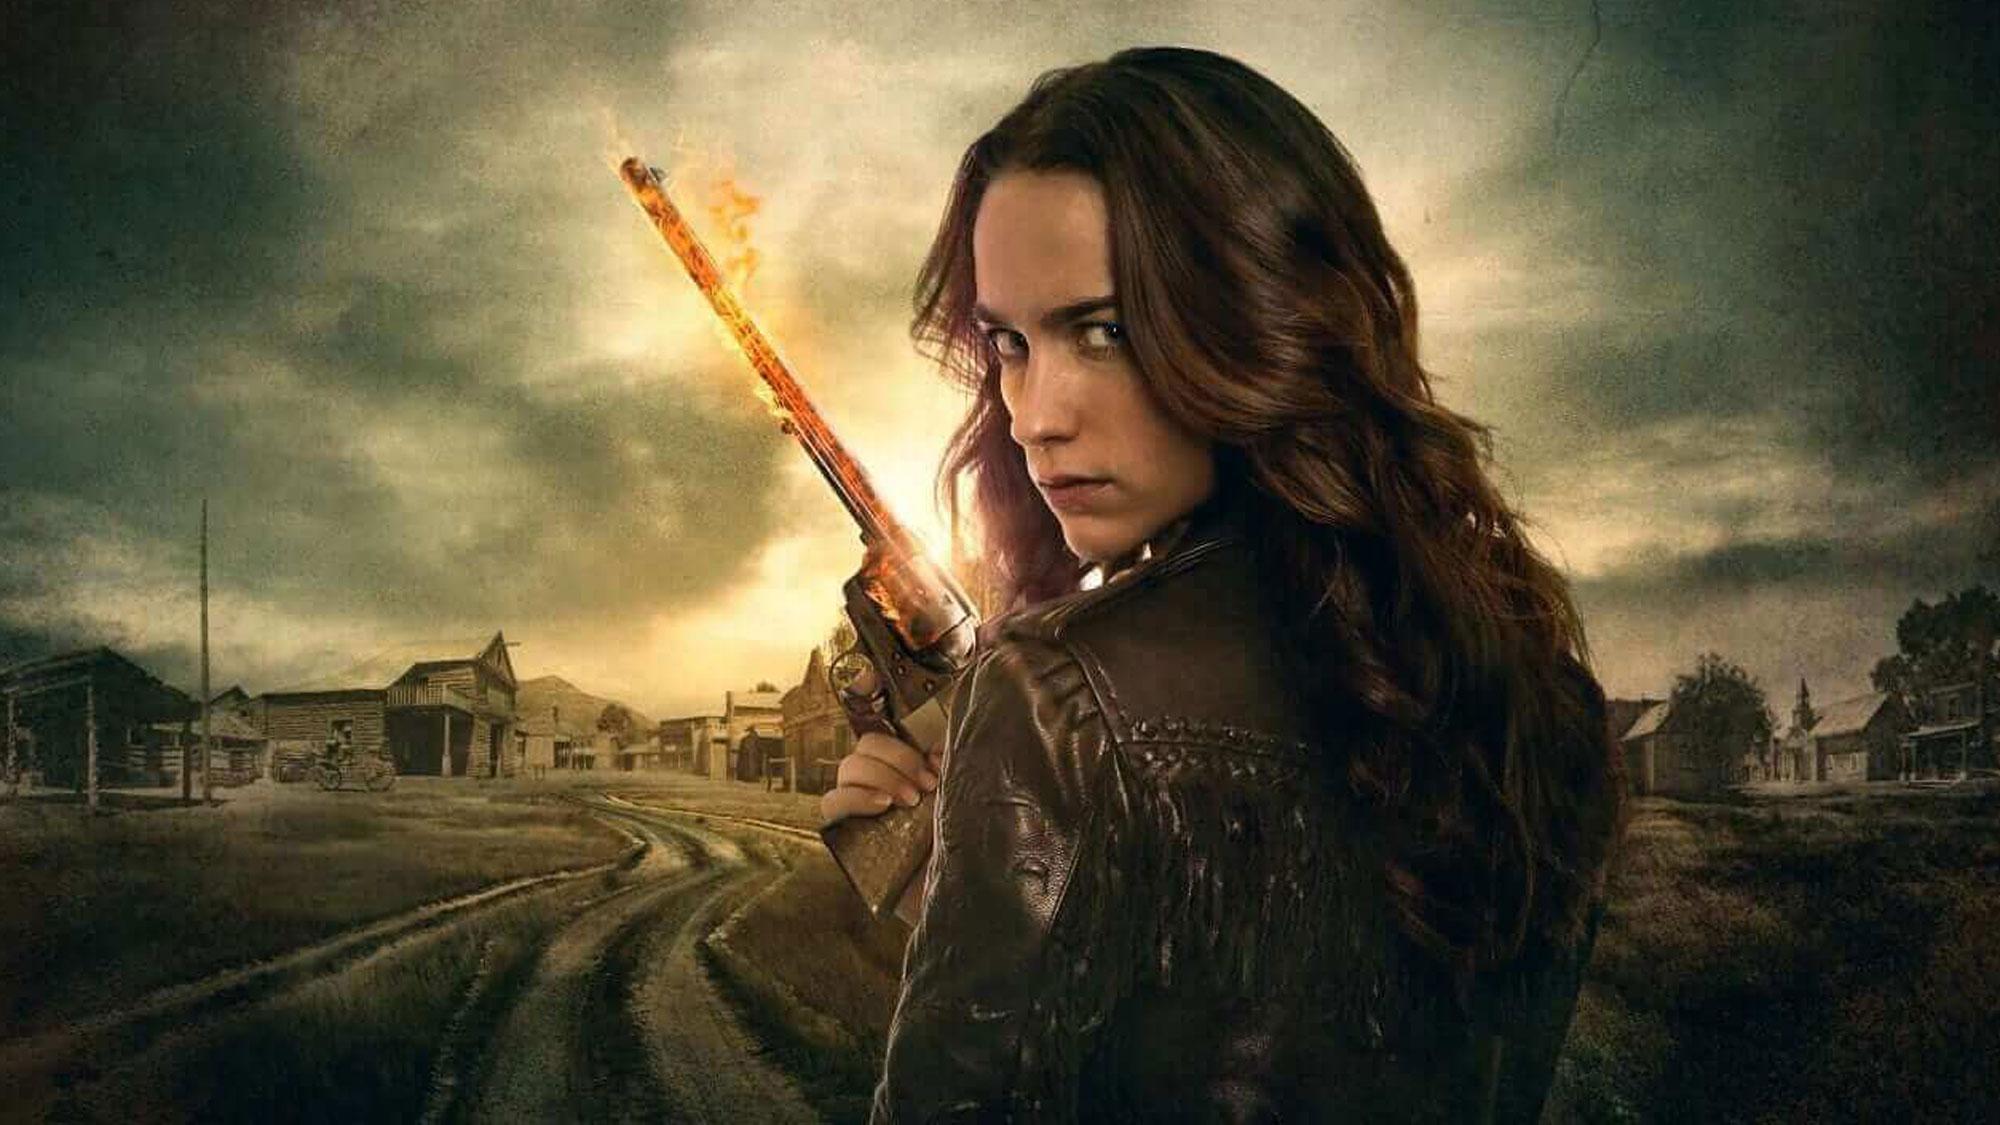 Canceled TV shows: Wynonna Earp season 4